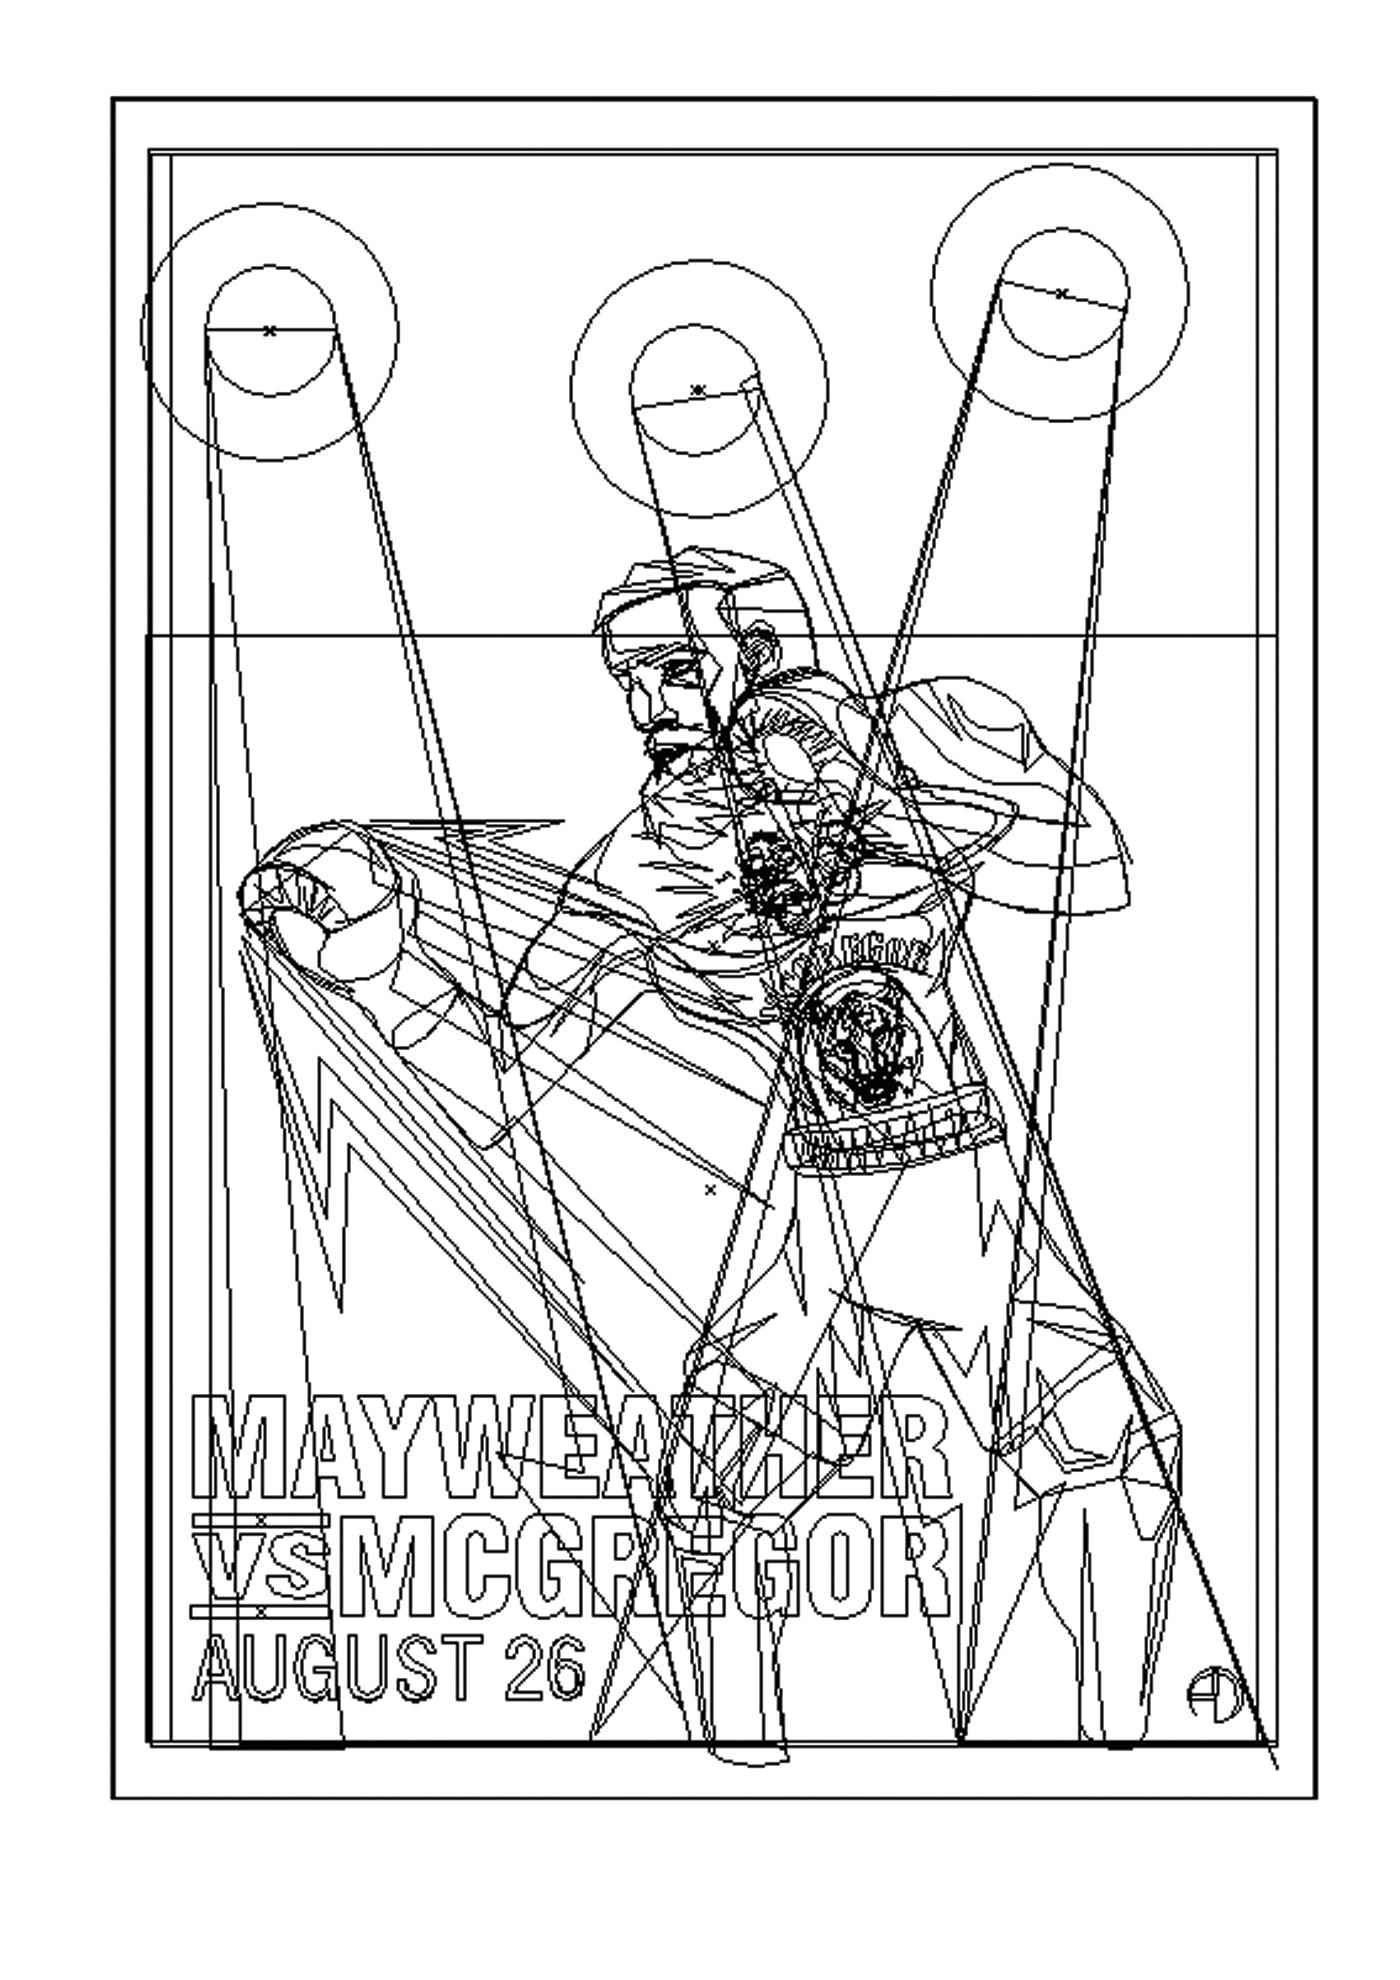 vector vectorart PosterArt ILLUSTRATION  printdesign artwork characterdesign vectordesign fanart art